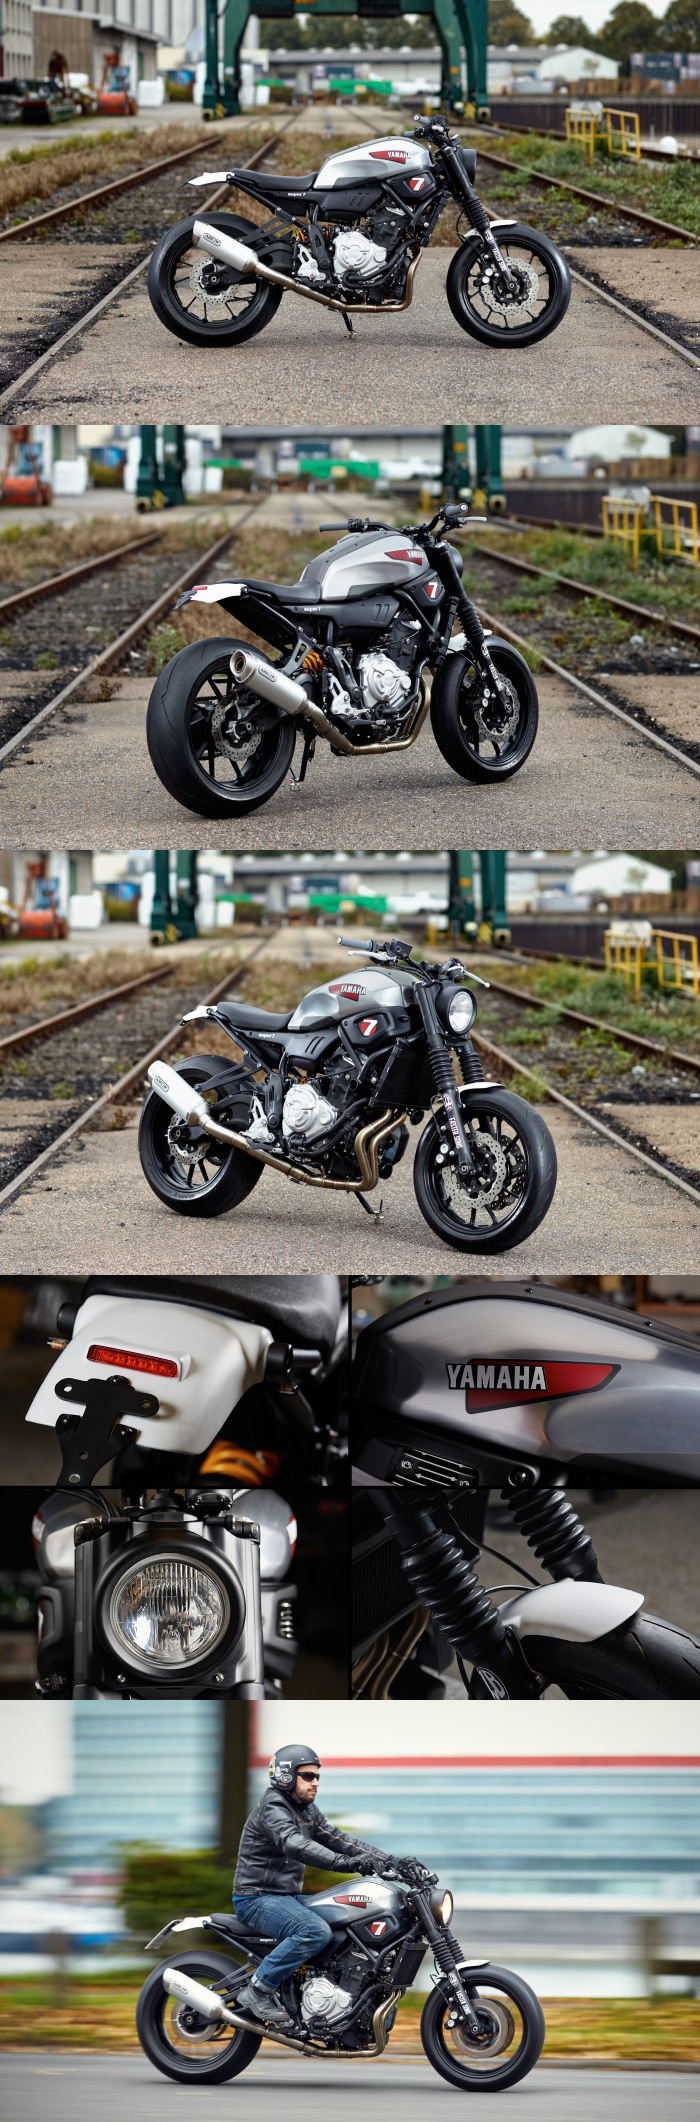 JVB MOTO XSR700 SUPER 7